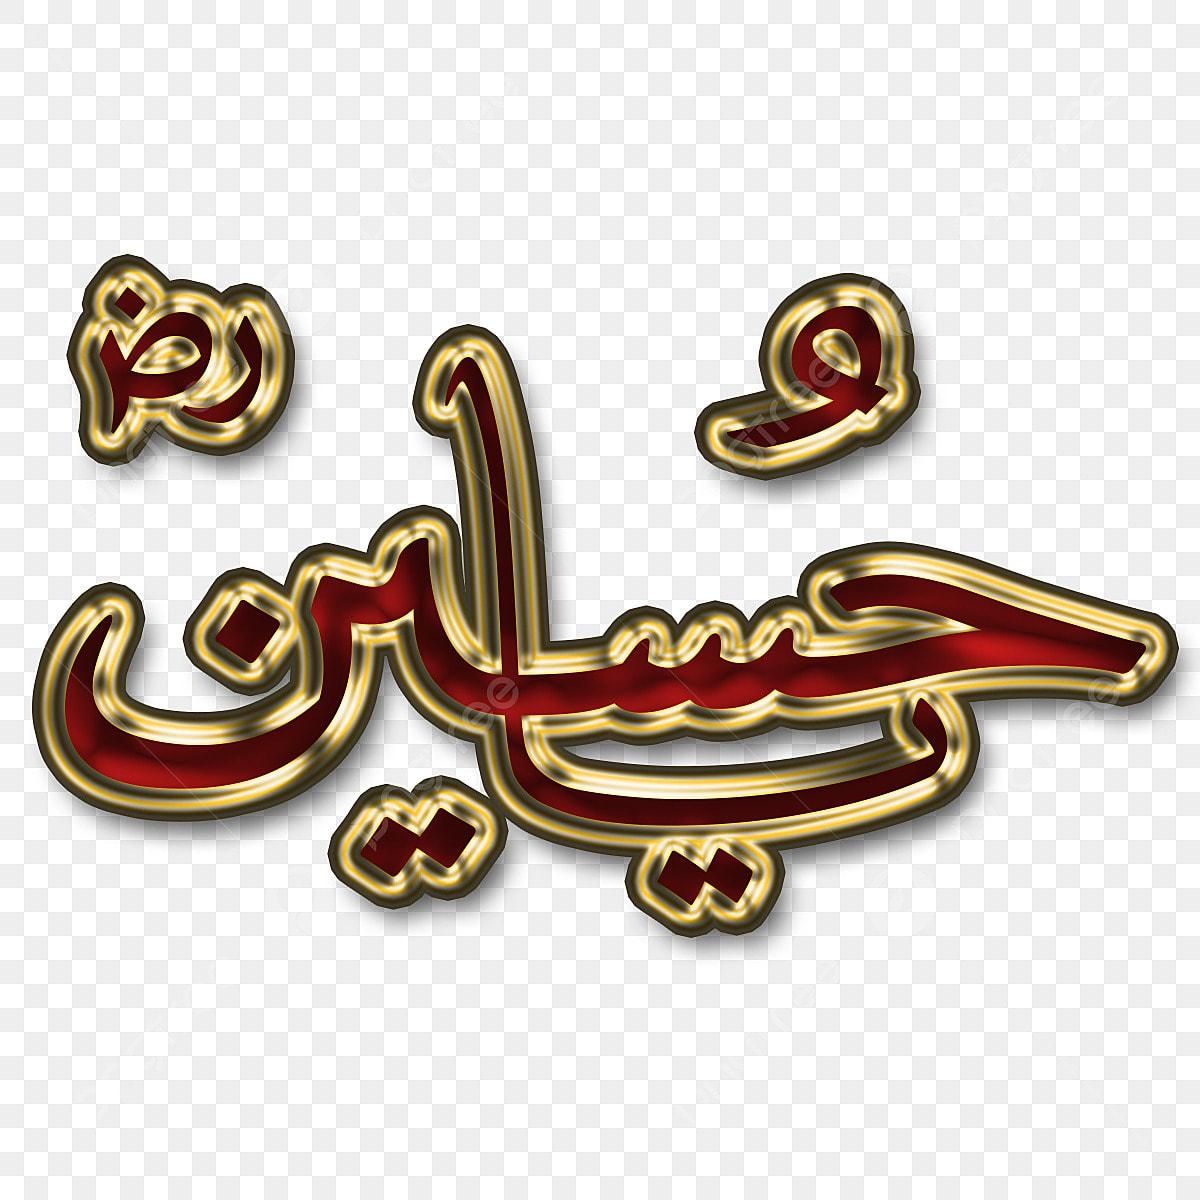 Ya Hussain Png Art Muharram Design Islamic Calligraphy With Gold